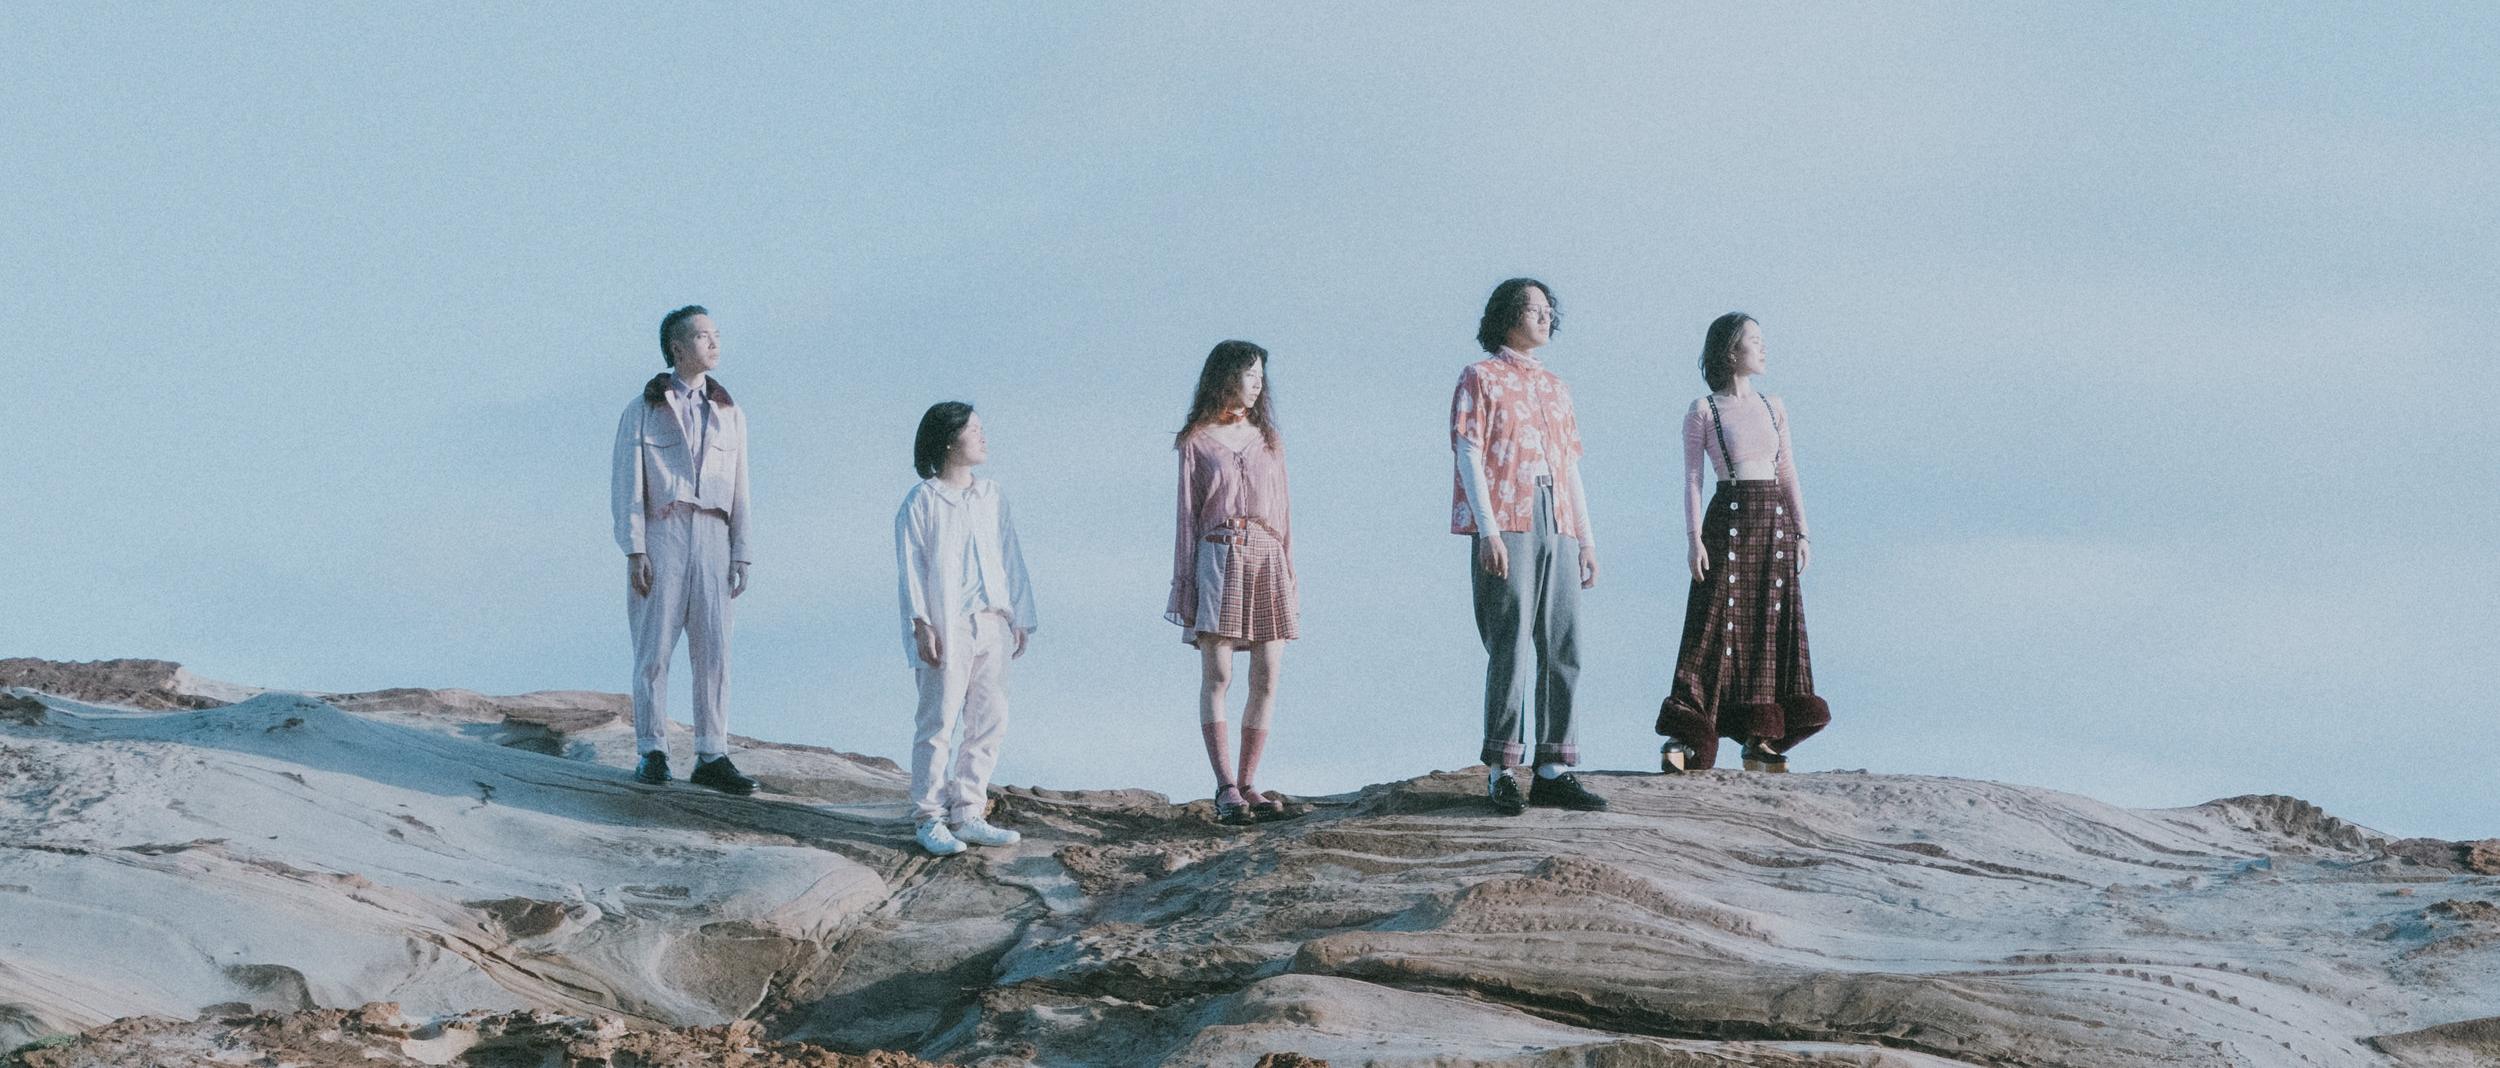 I Mean Us - 대만 (Taiwan)